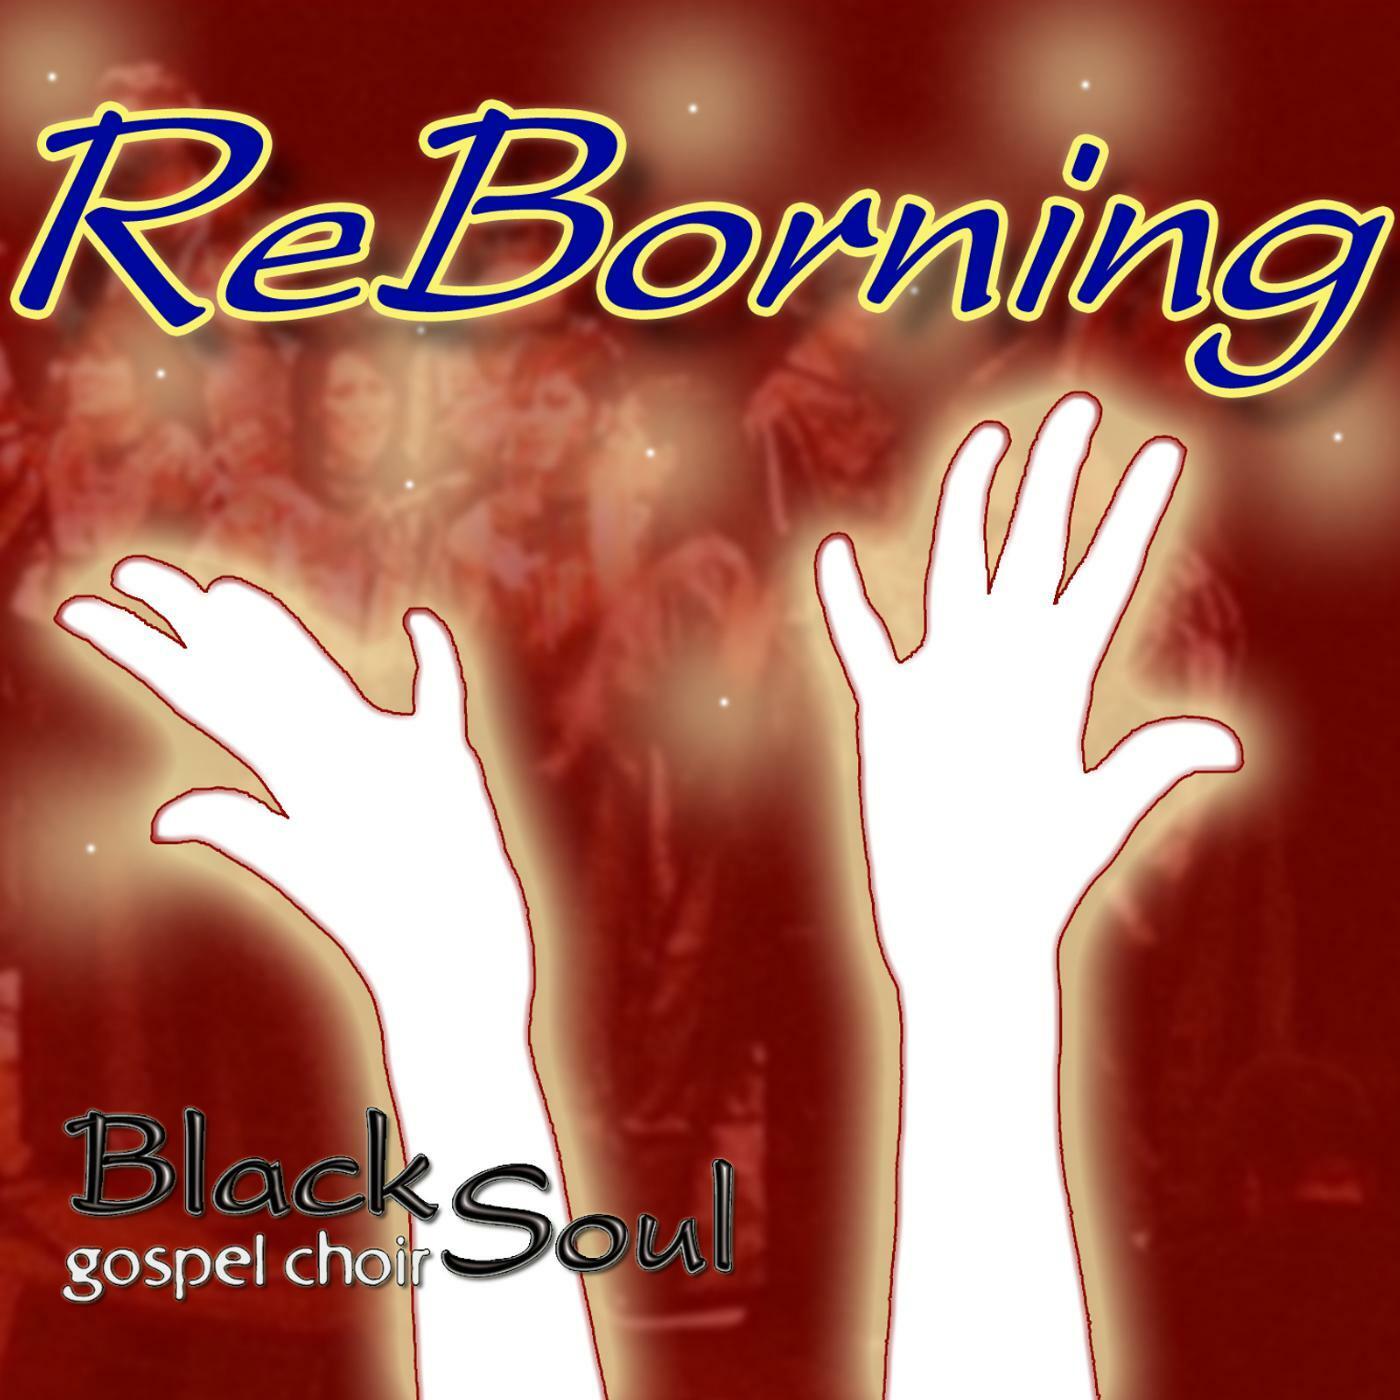 Black Soul Gospel Choir Radio: Listen to Free Music & Get The Latest